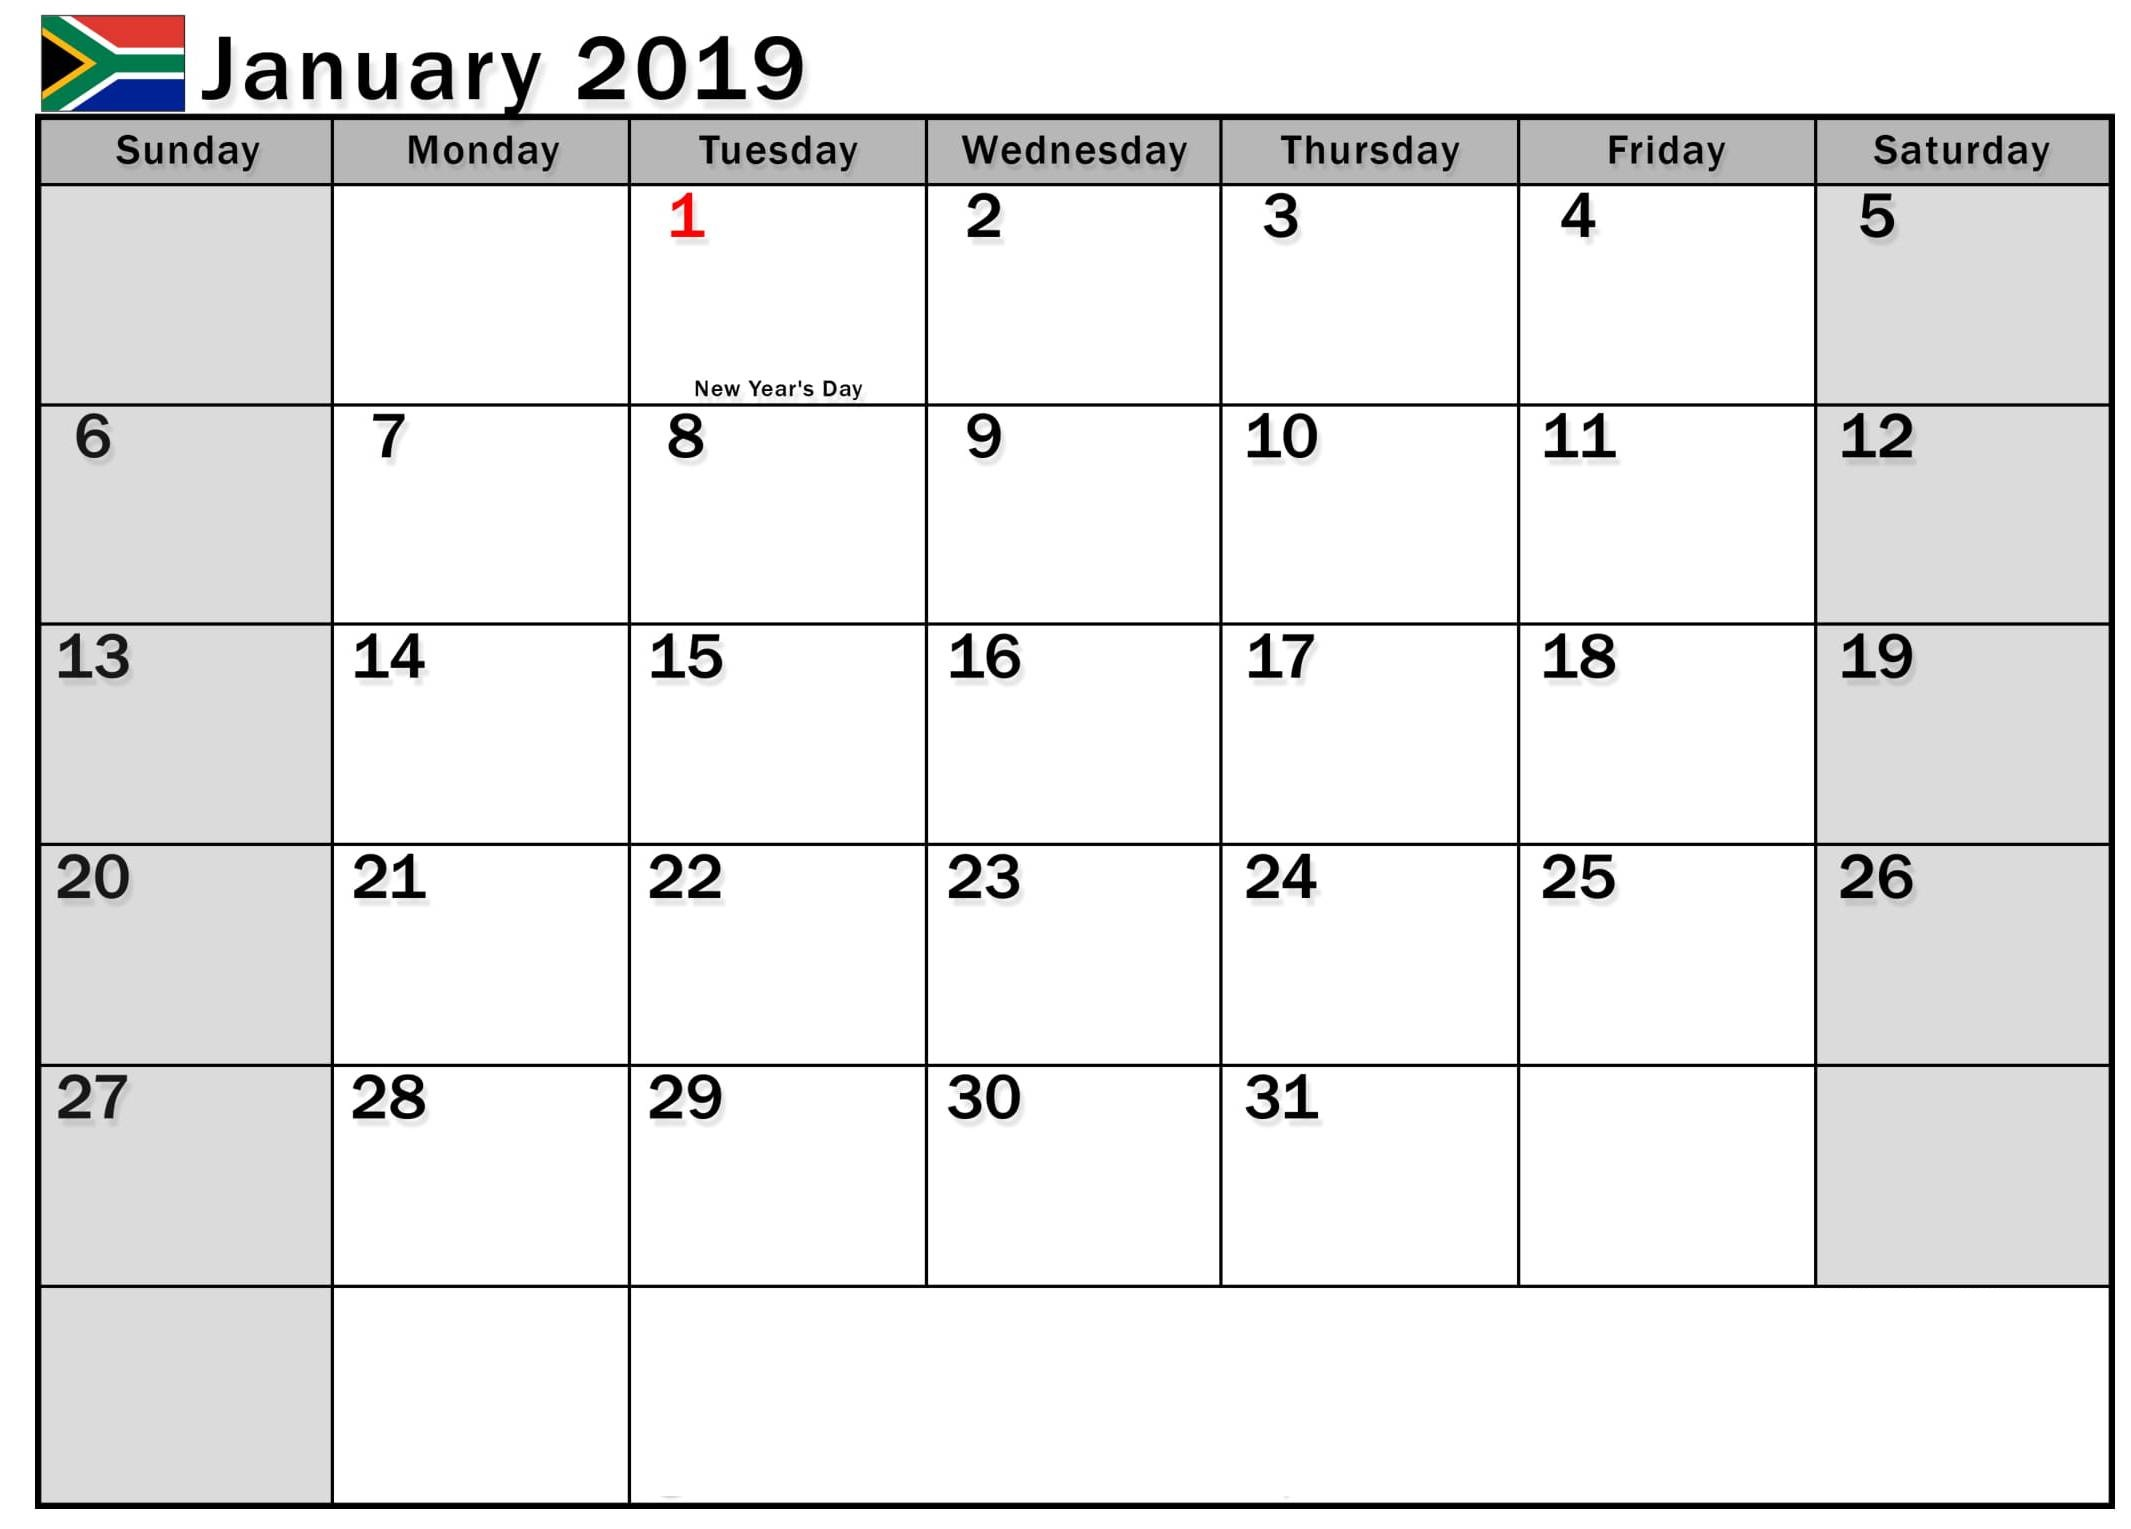 January 2019 Calendar South Africa